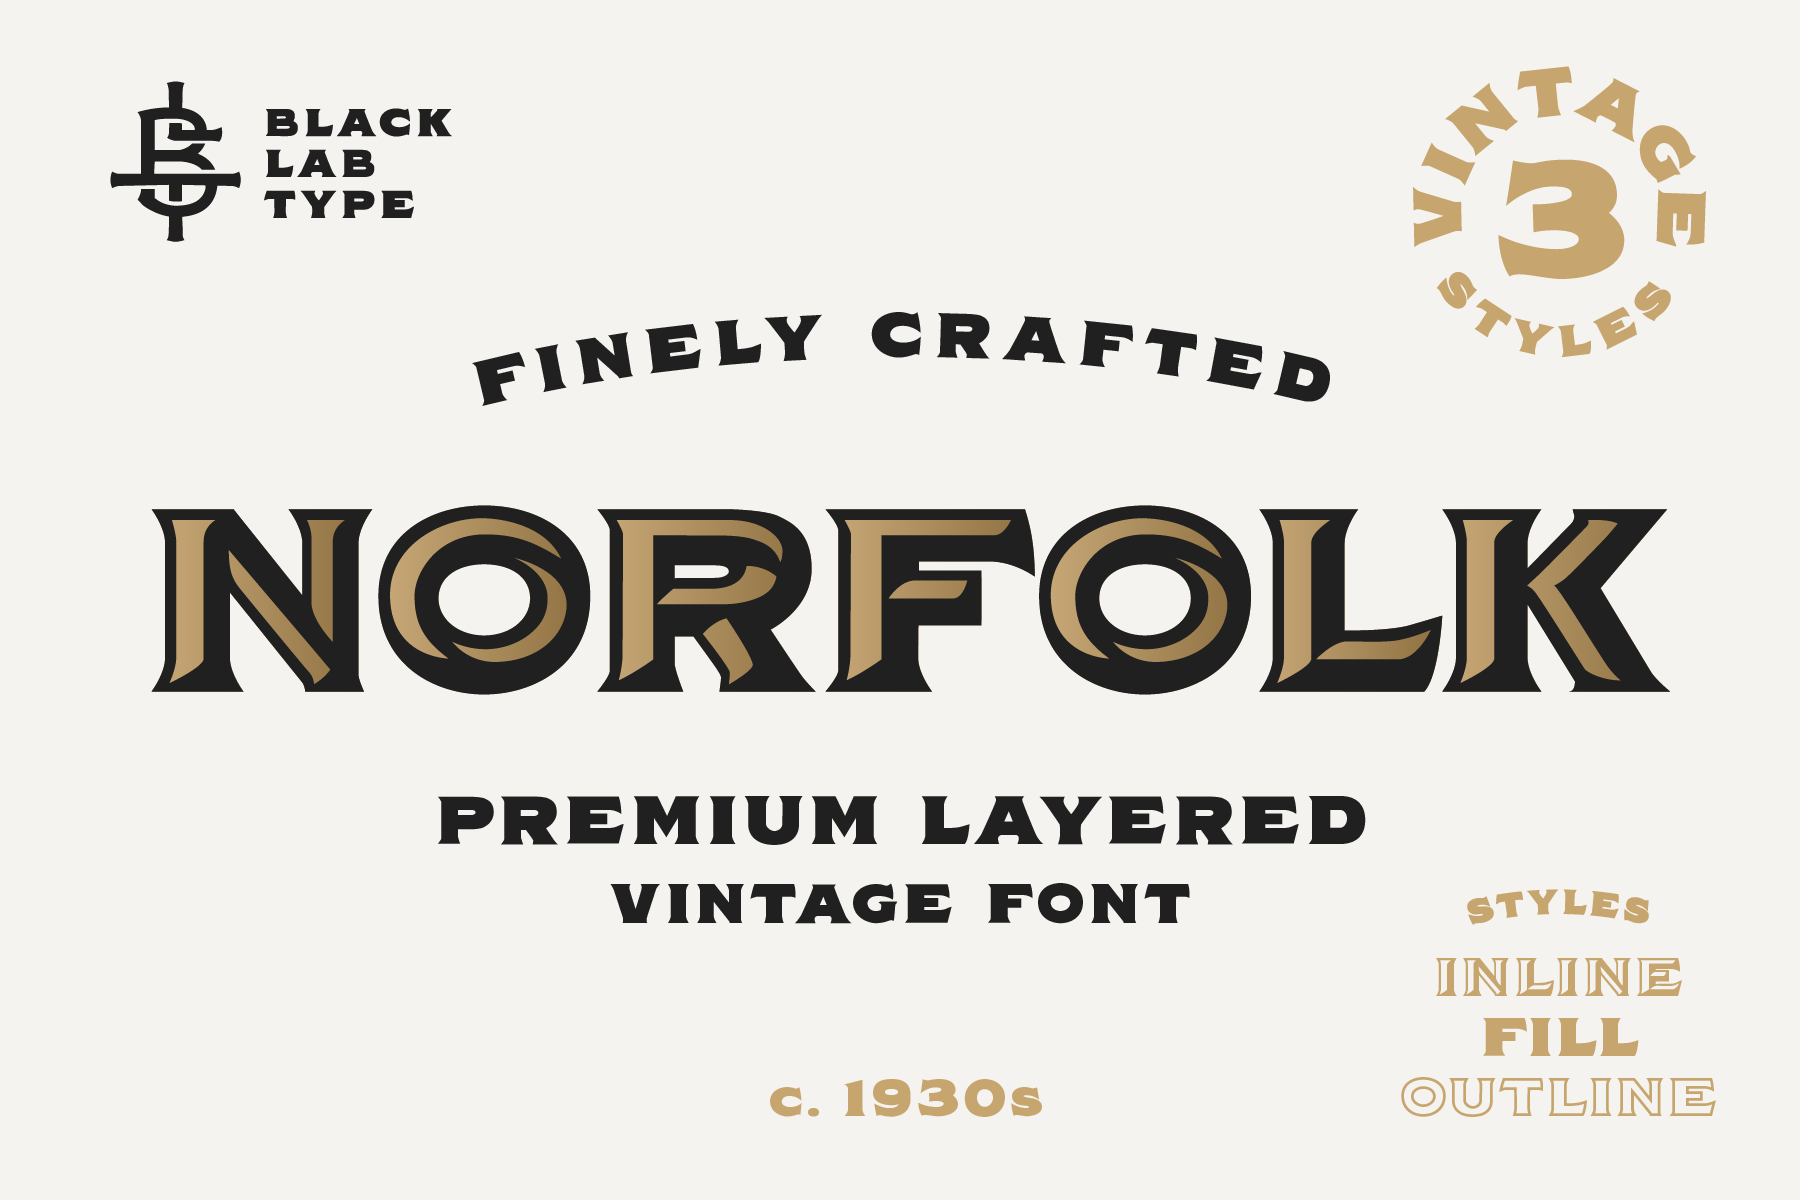 Norfolk - Vintage Display Font example image 1